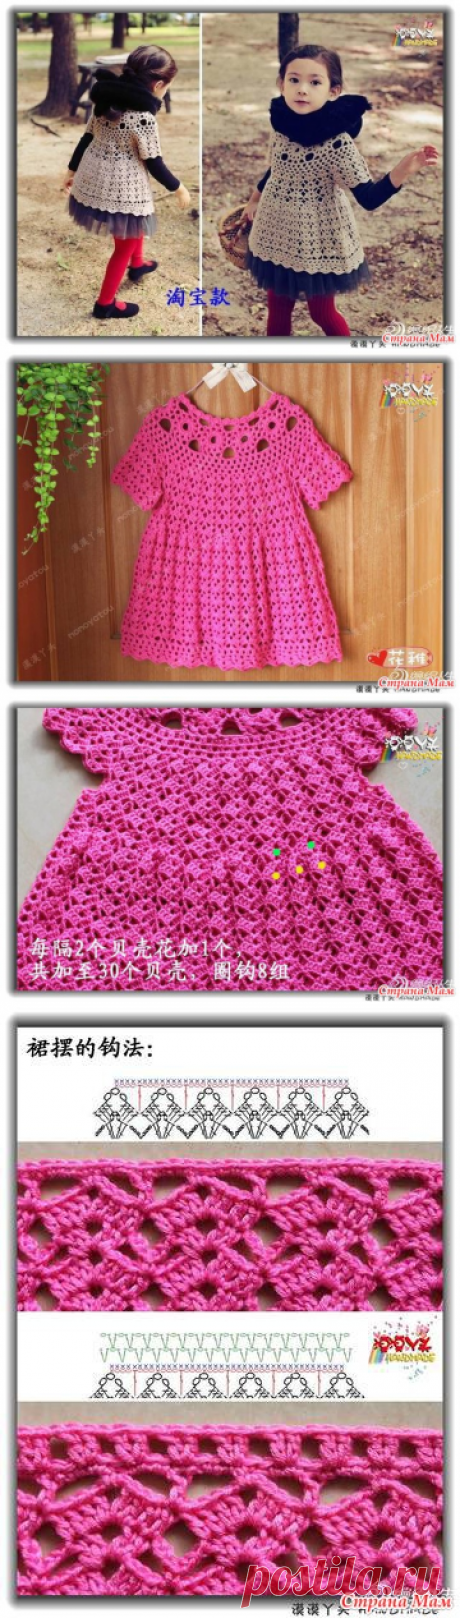 Платье (туника) от китайских мастериц. - Вяжем вместе он-лайн - Страна Мам